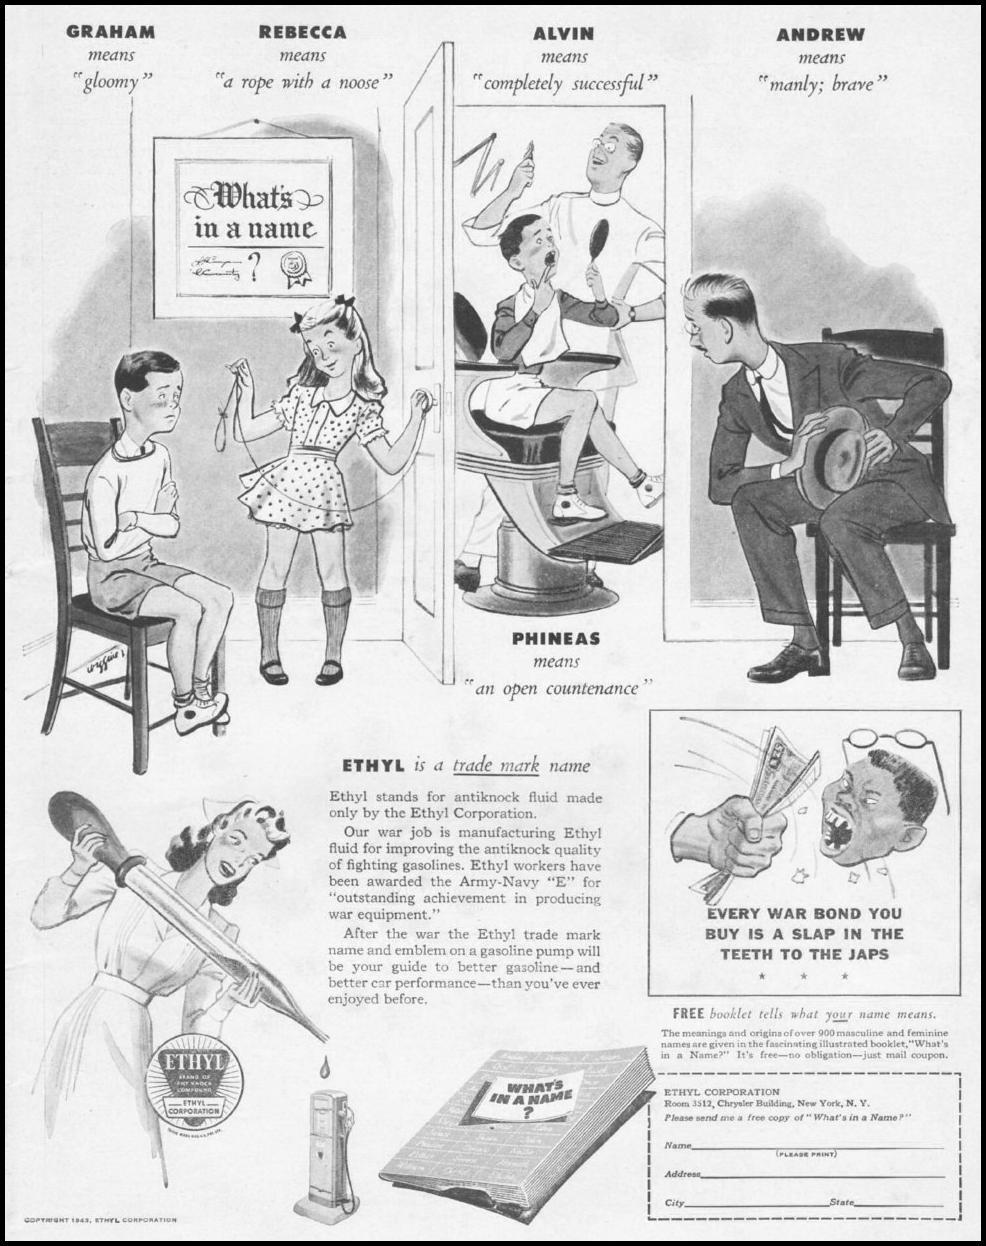 ETHYL GASOLINE LIFE 10/25/1943 p. 1